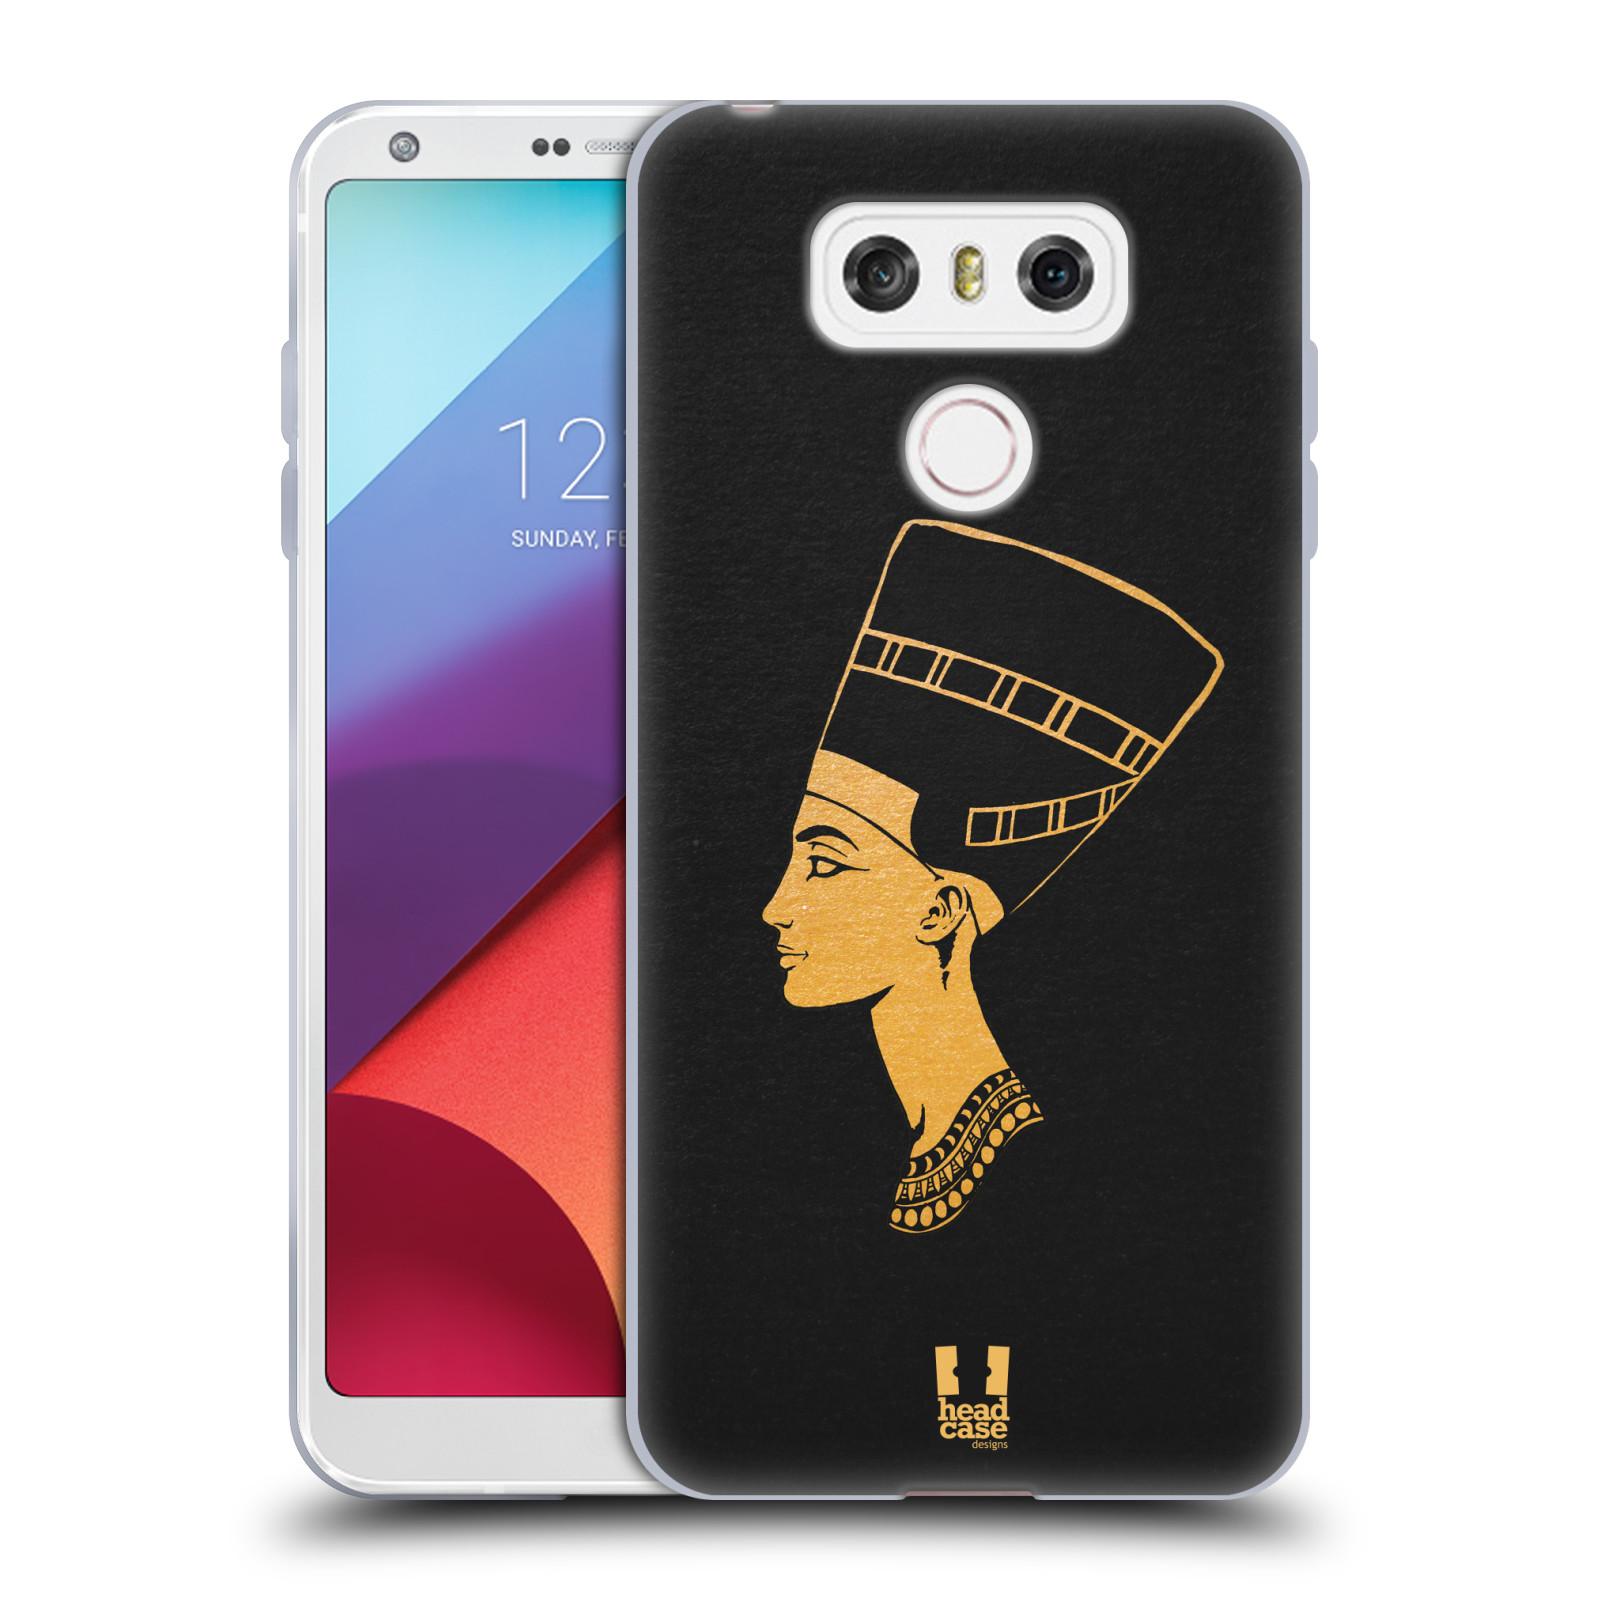 Silikonové pouzdro na mobil LG G6 - Head Case EGYPT NEFERTITI (Silikonový kryt či obal na mobilní telefon LG G6 H870 / LG G6 Dual SIM H870DS)